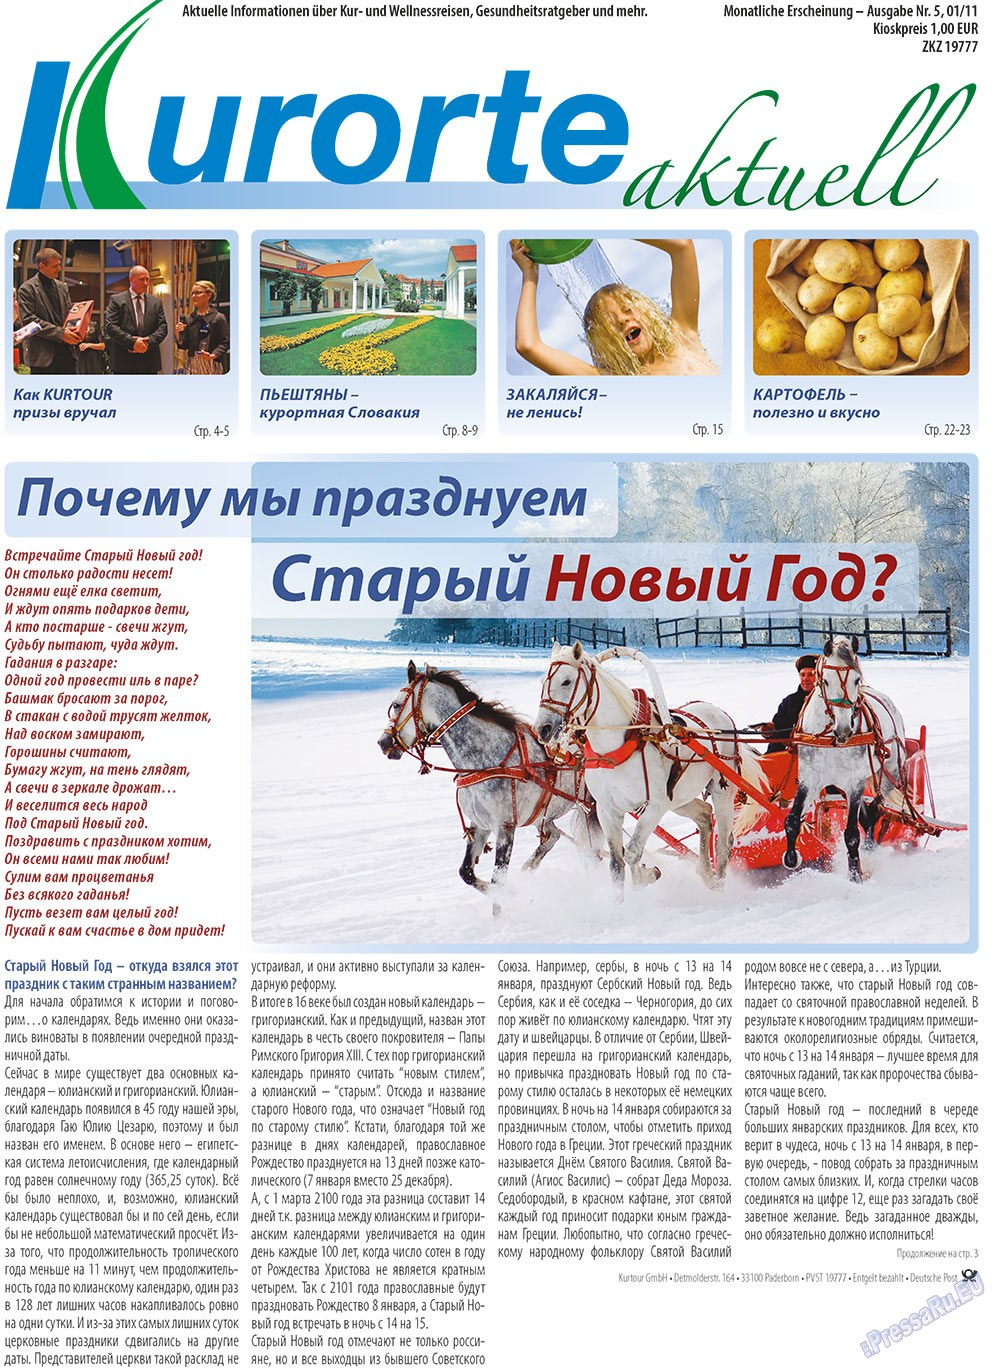 Kurorte aktuell (газета). 2011 год, номер 1, стр. 1